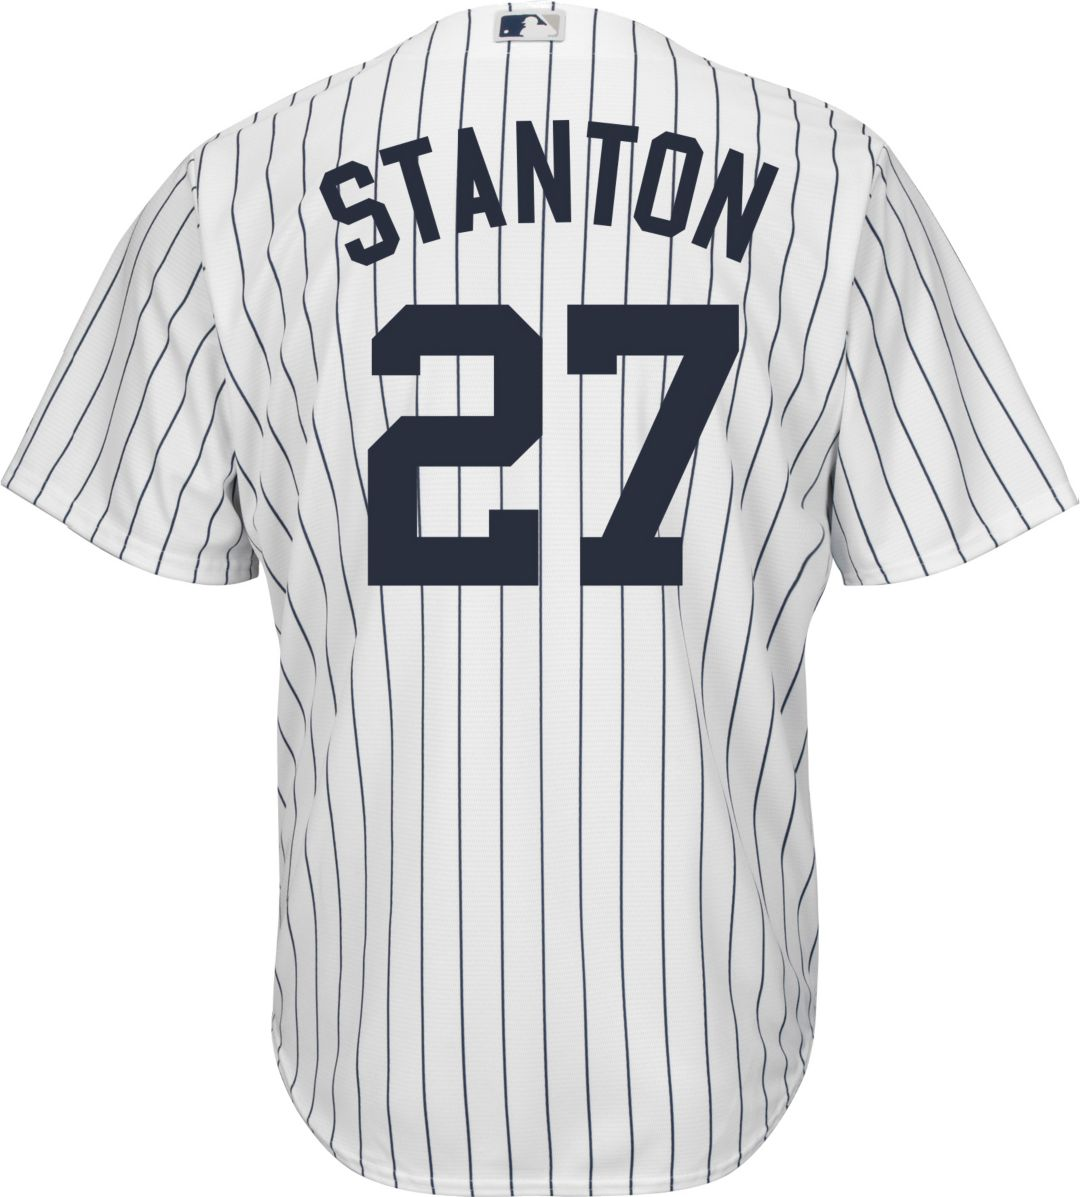 big sale 629ed ef420 Youth Replica New York Yankees Giancarlo Stanton #27 Home White Jersey